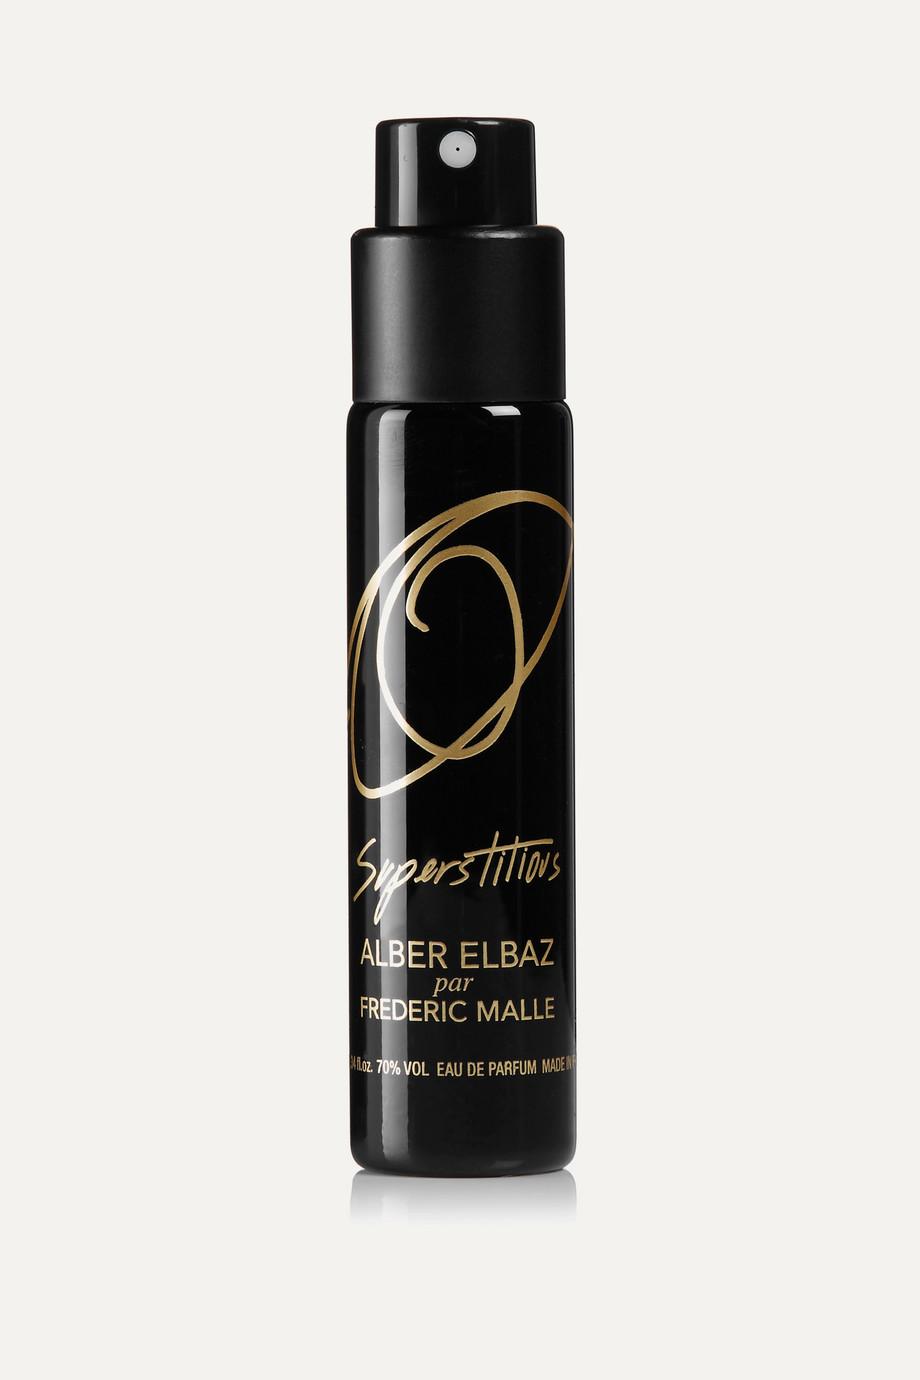 Frederic Malle Superstitious Eau de Parfum - Turkish Rose, Egyptian Jasmine & Aldehyde, 10ml